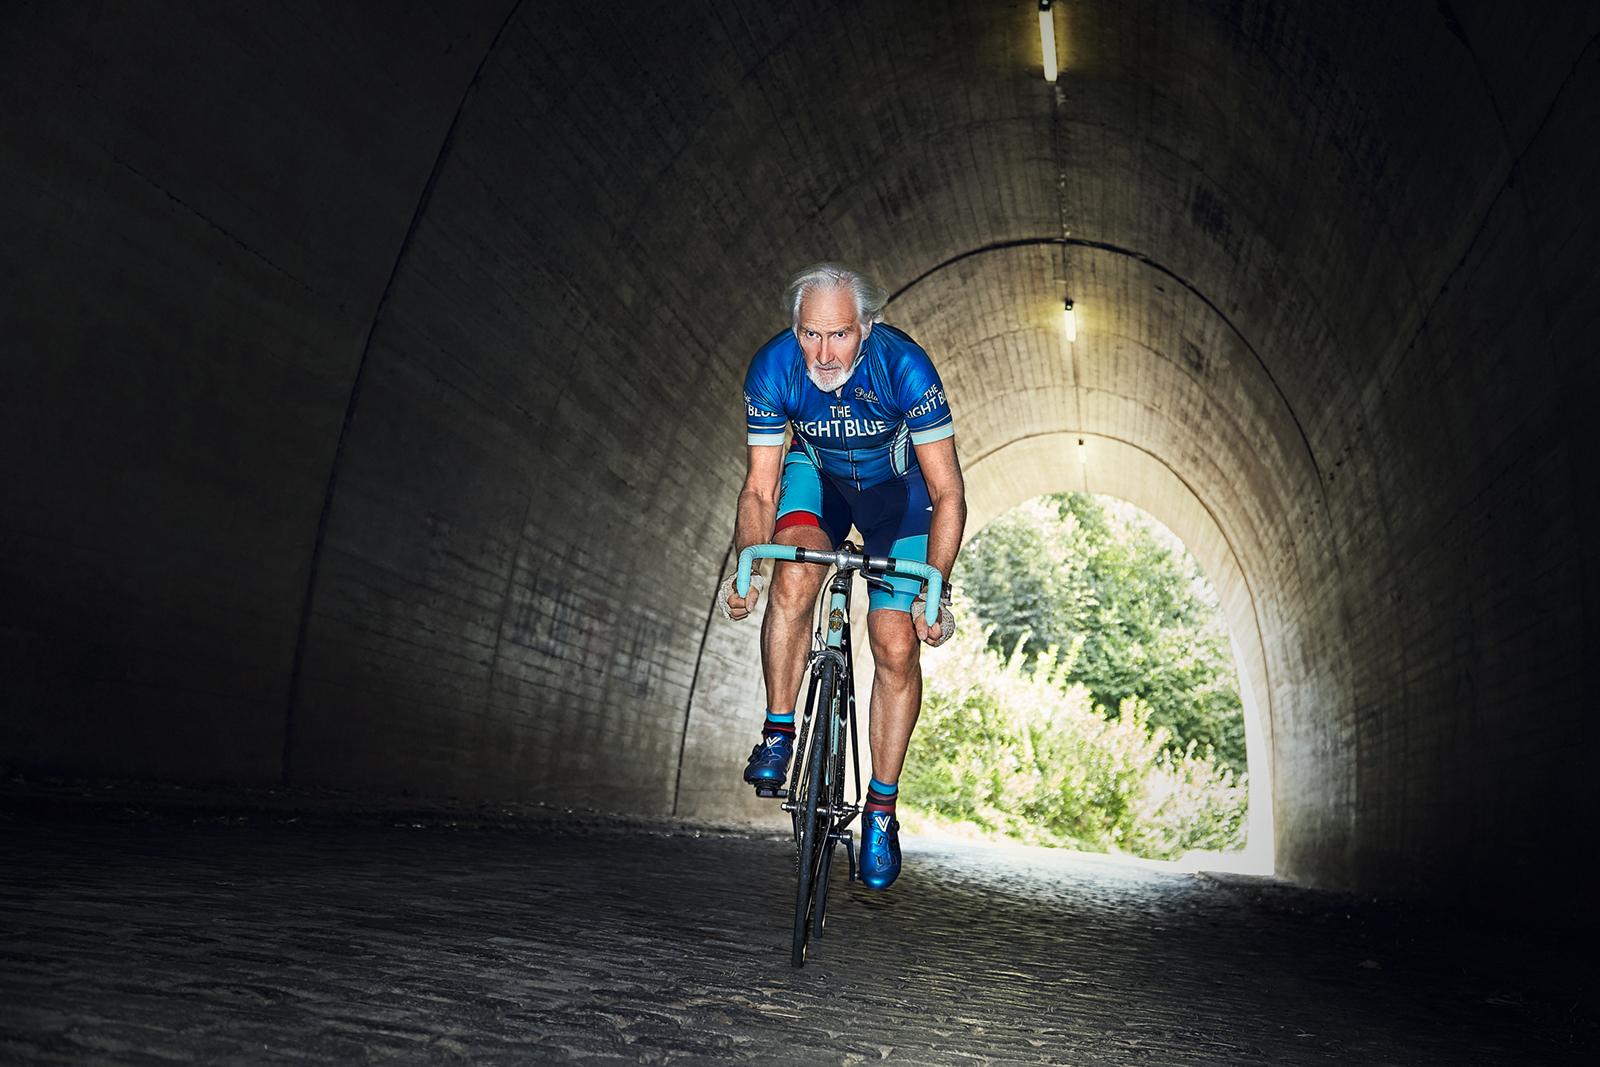 The Light Blue Cycles UK, Model: Richard Pratt, Ricci Sports